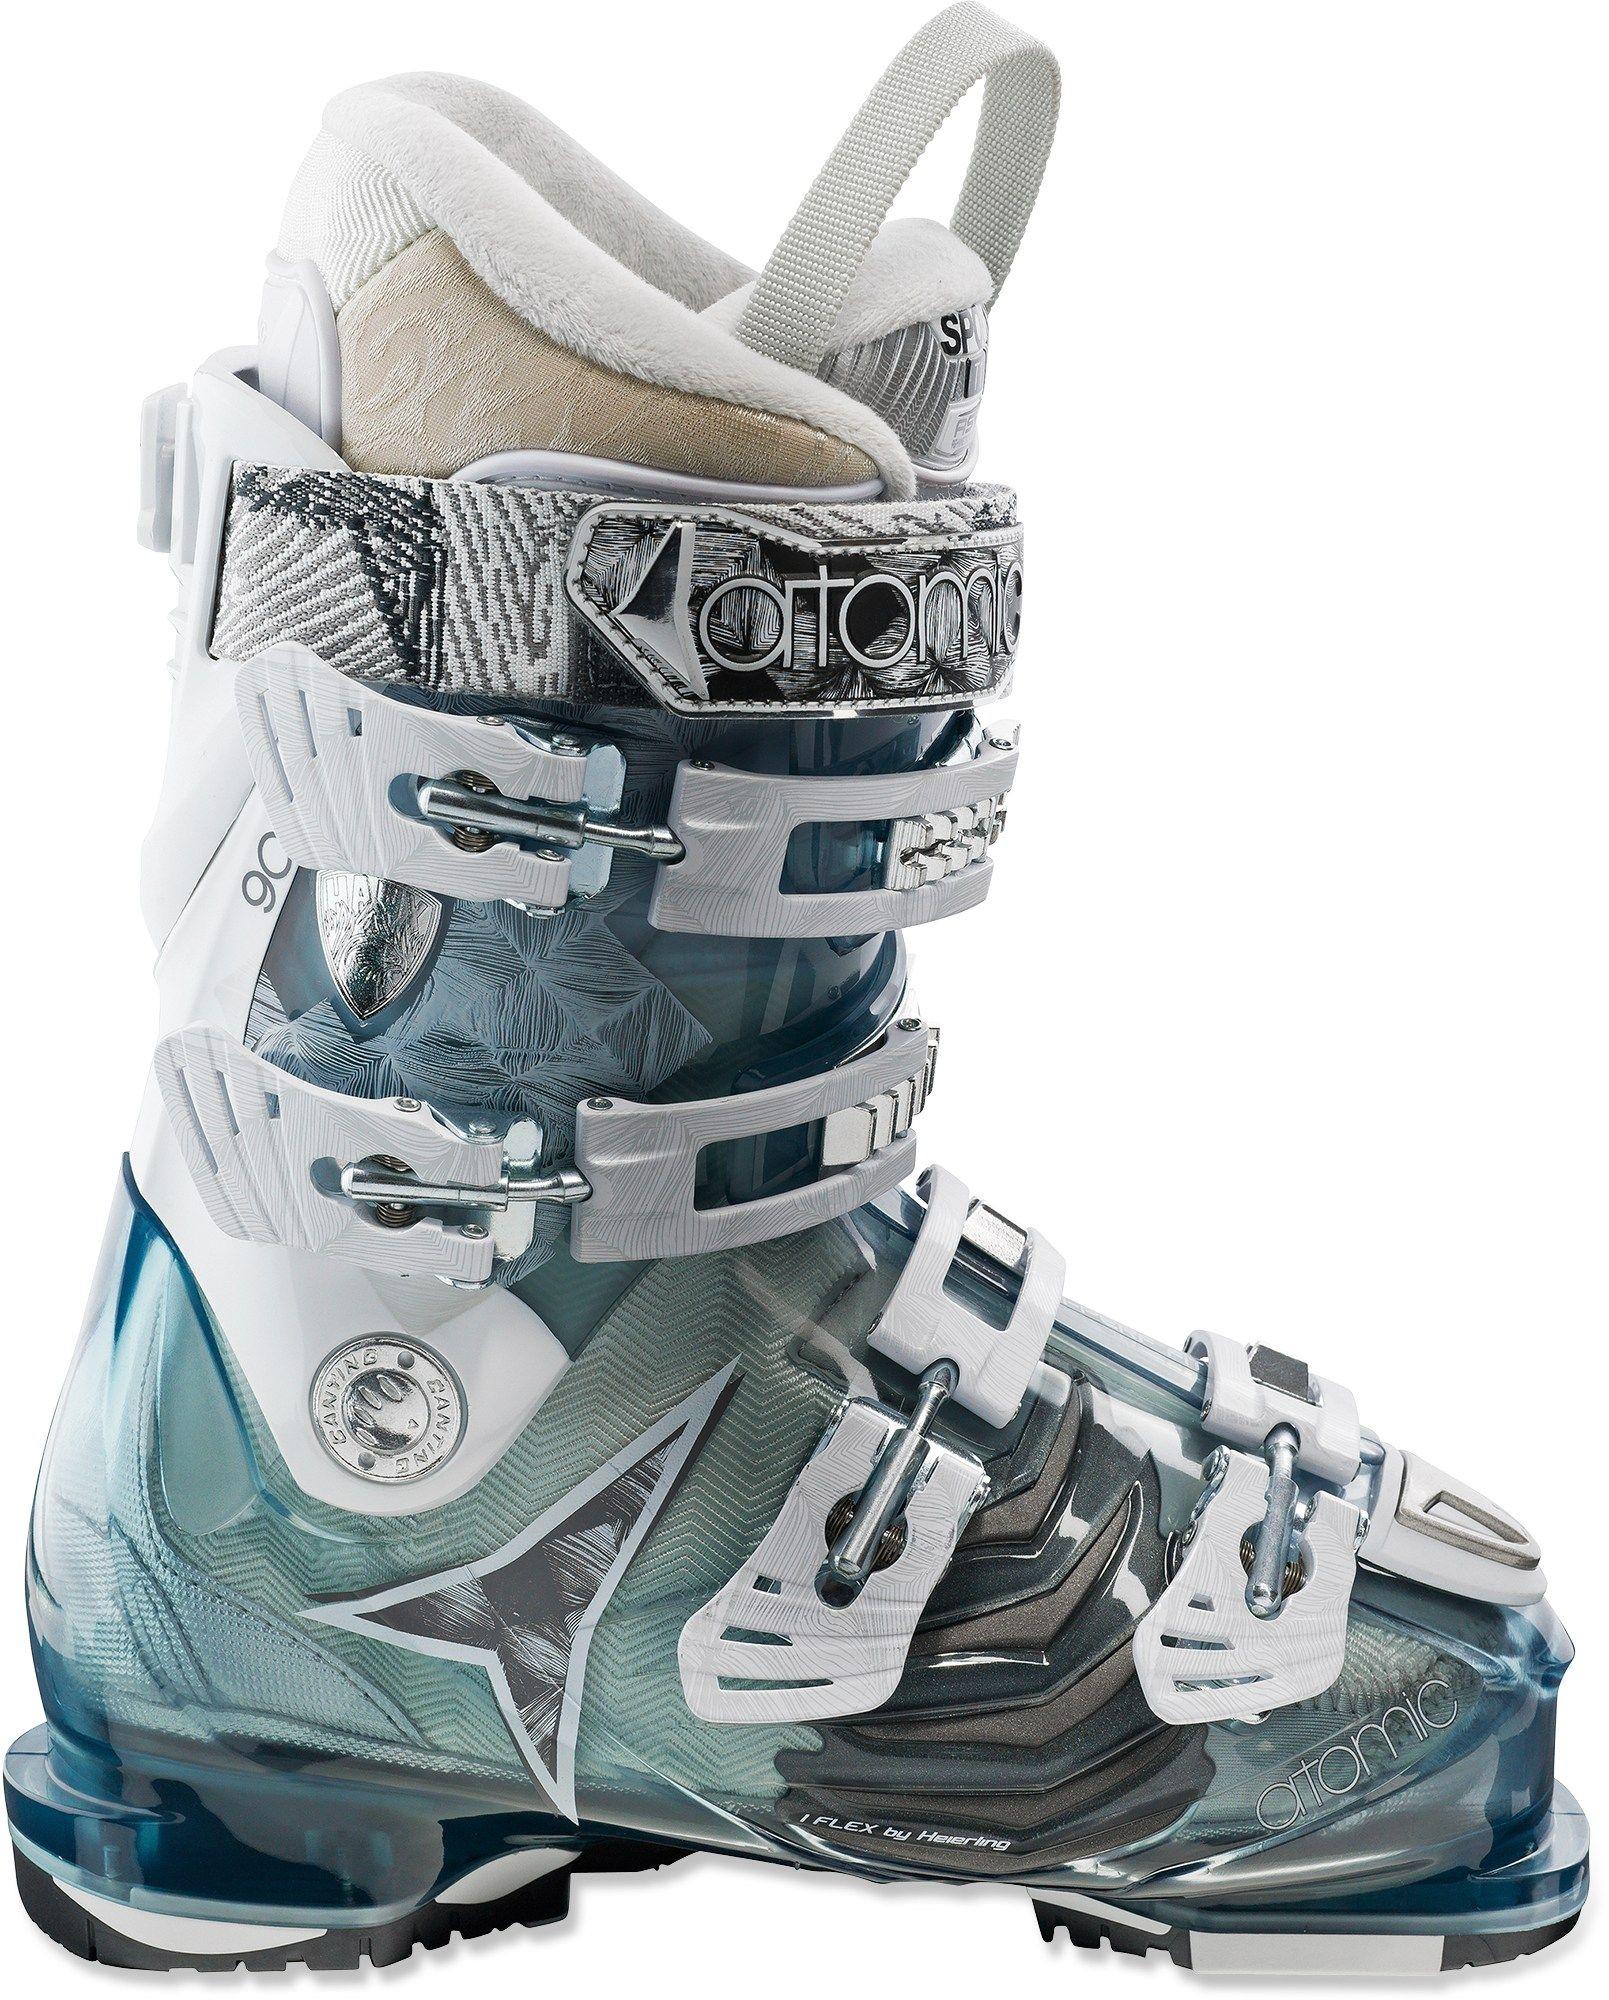 Atomic hawx 90 w ski boots women s 2012 2013 free shipping at